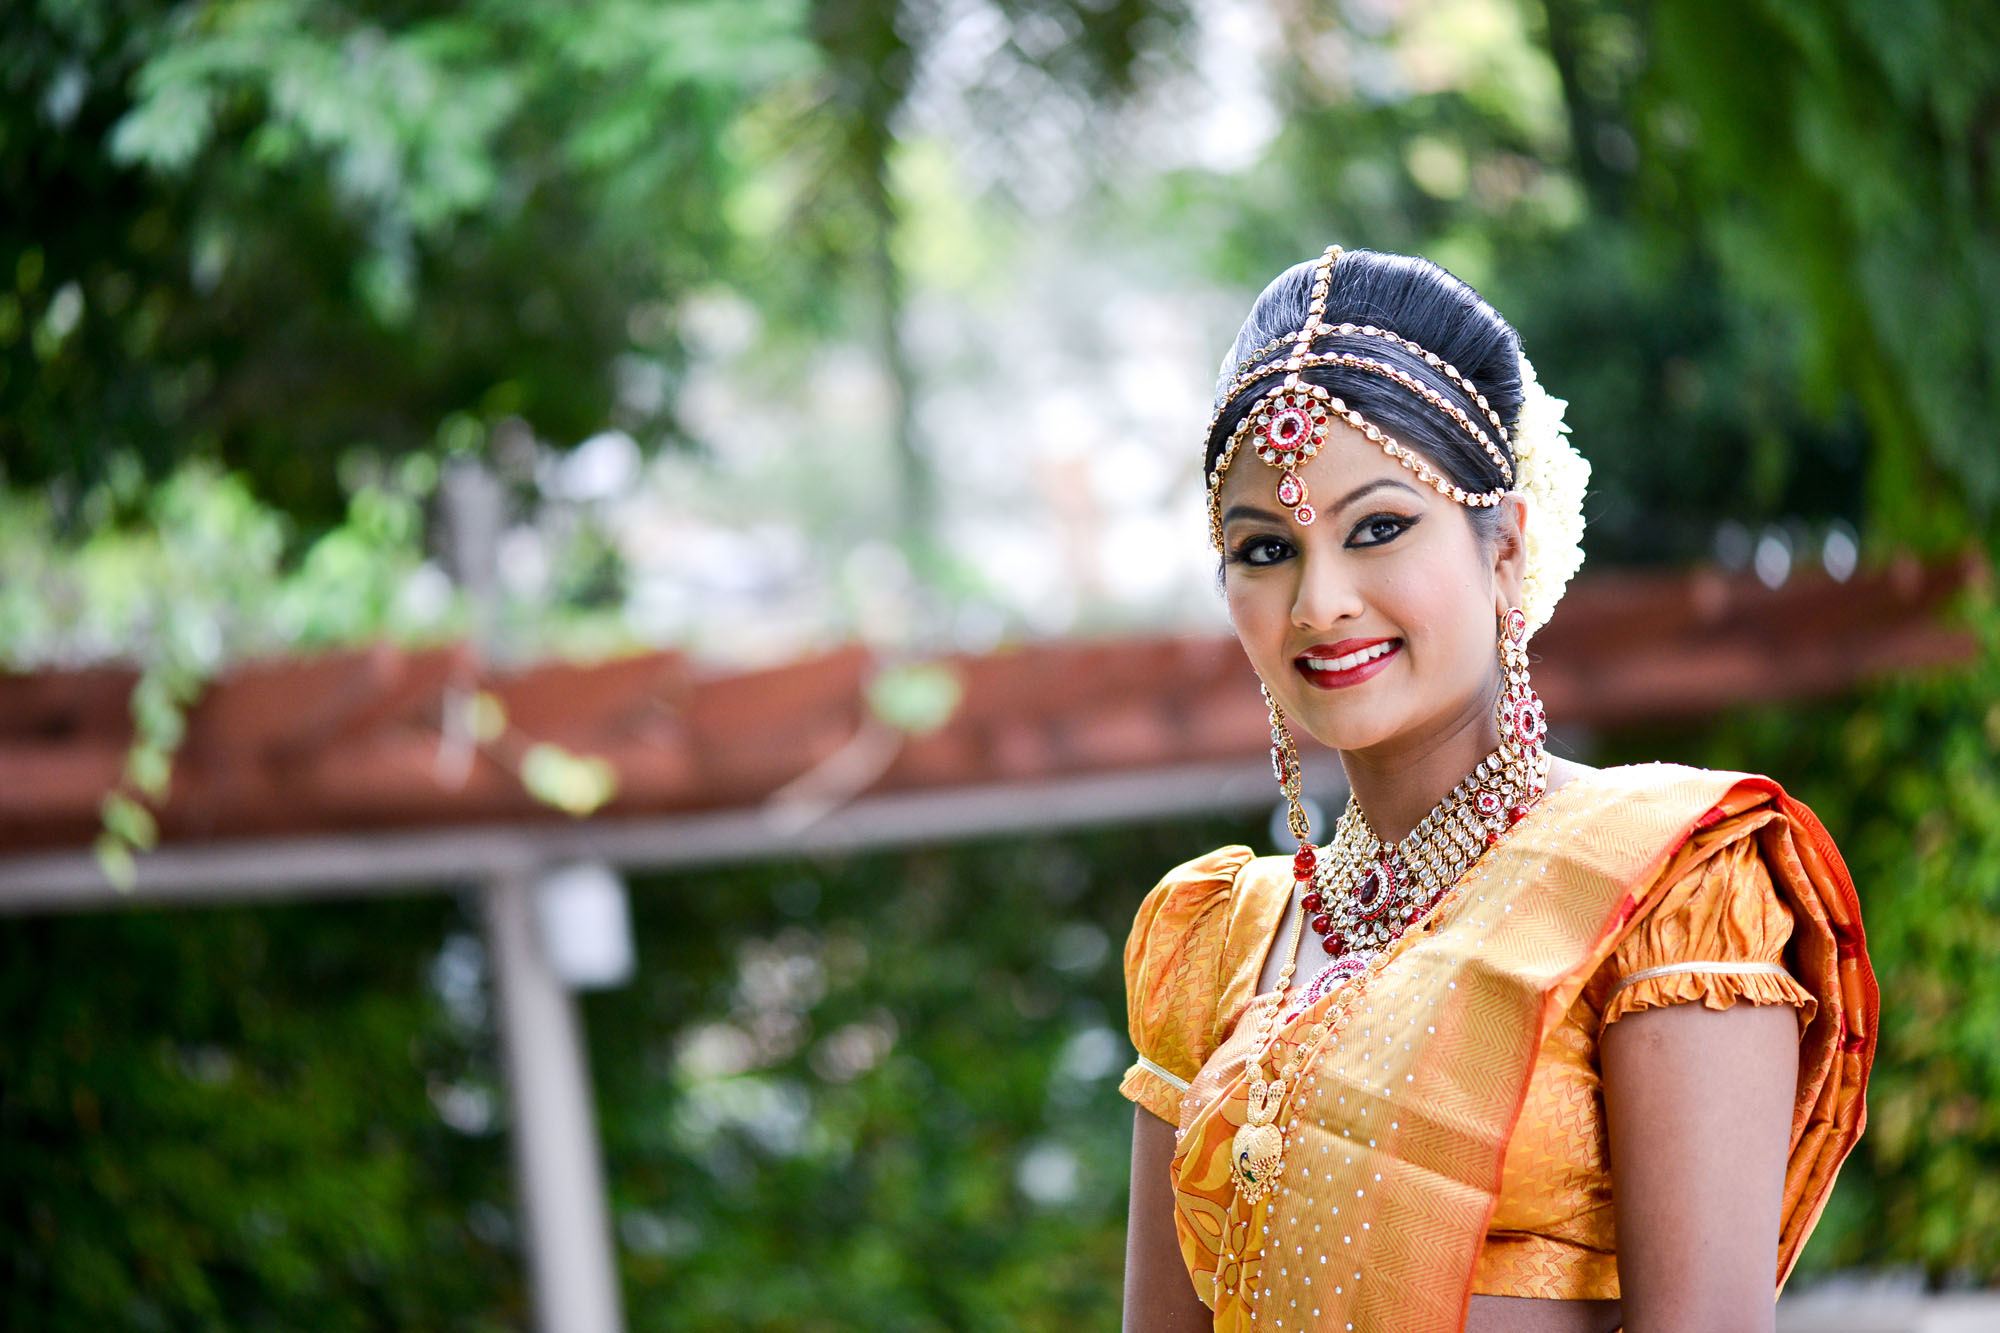 Amore_Production_Indian_Wedding_Photographer (8)